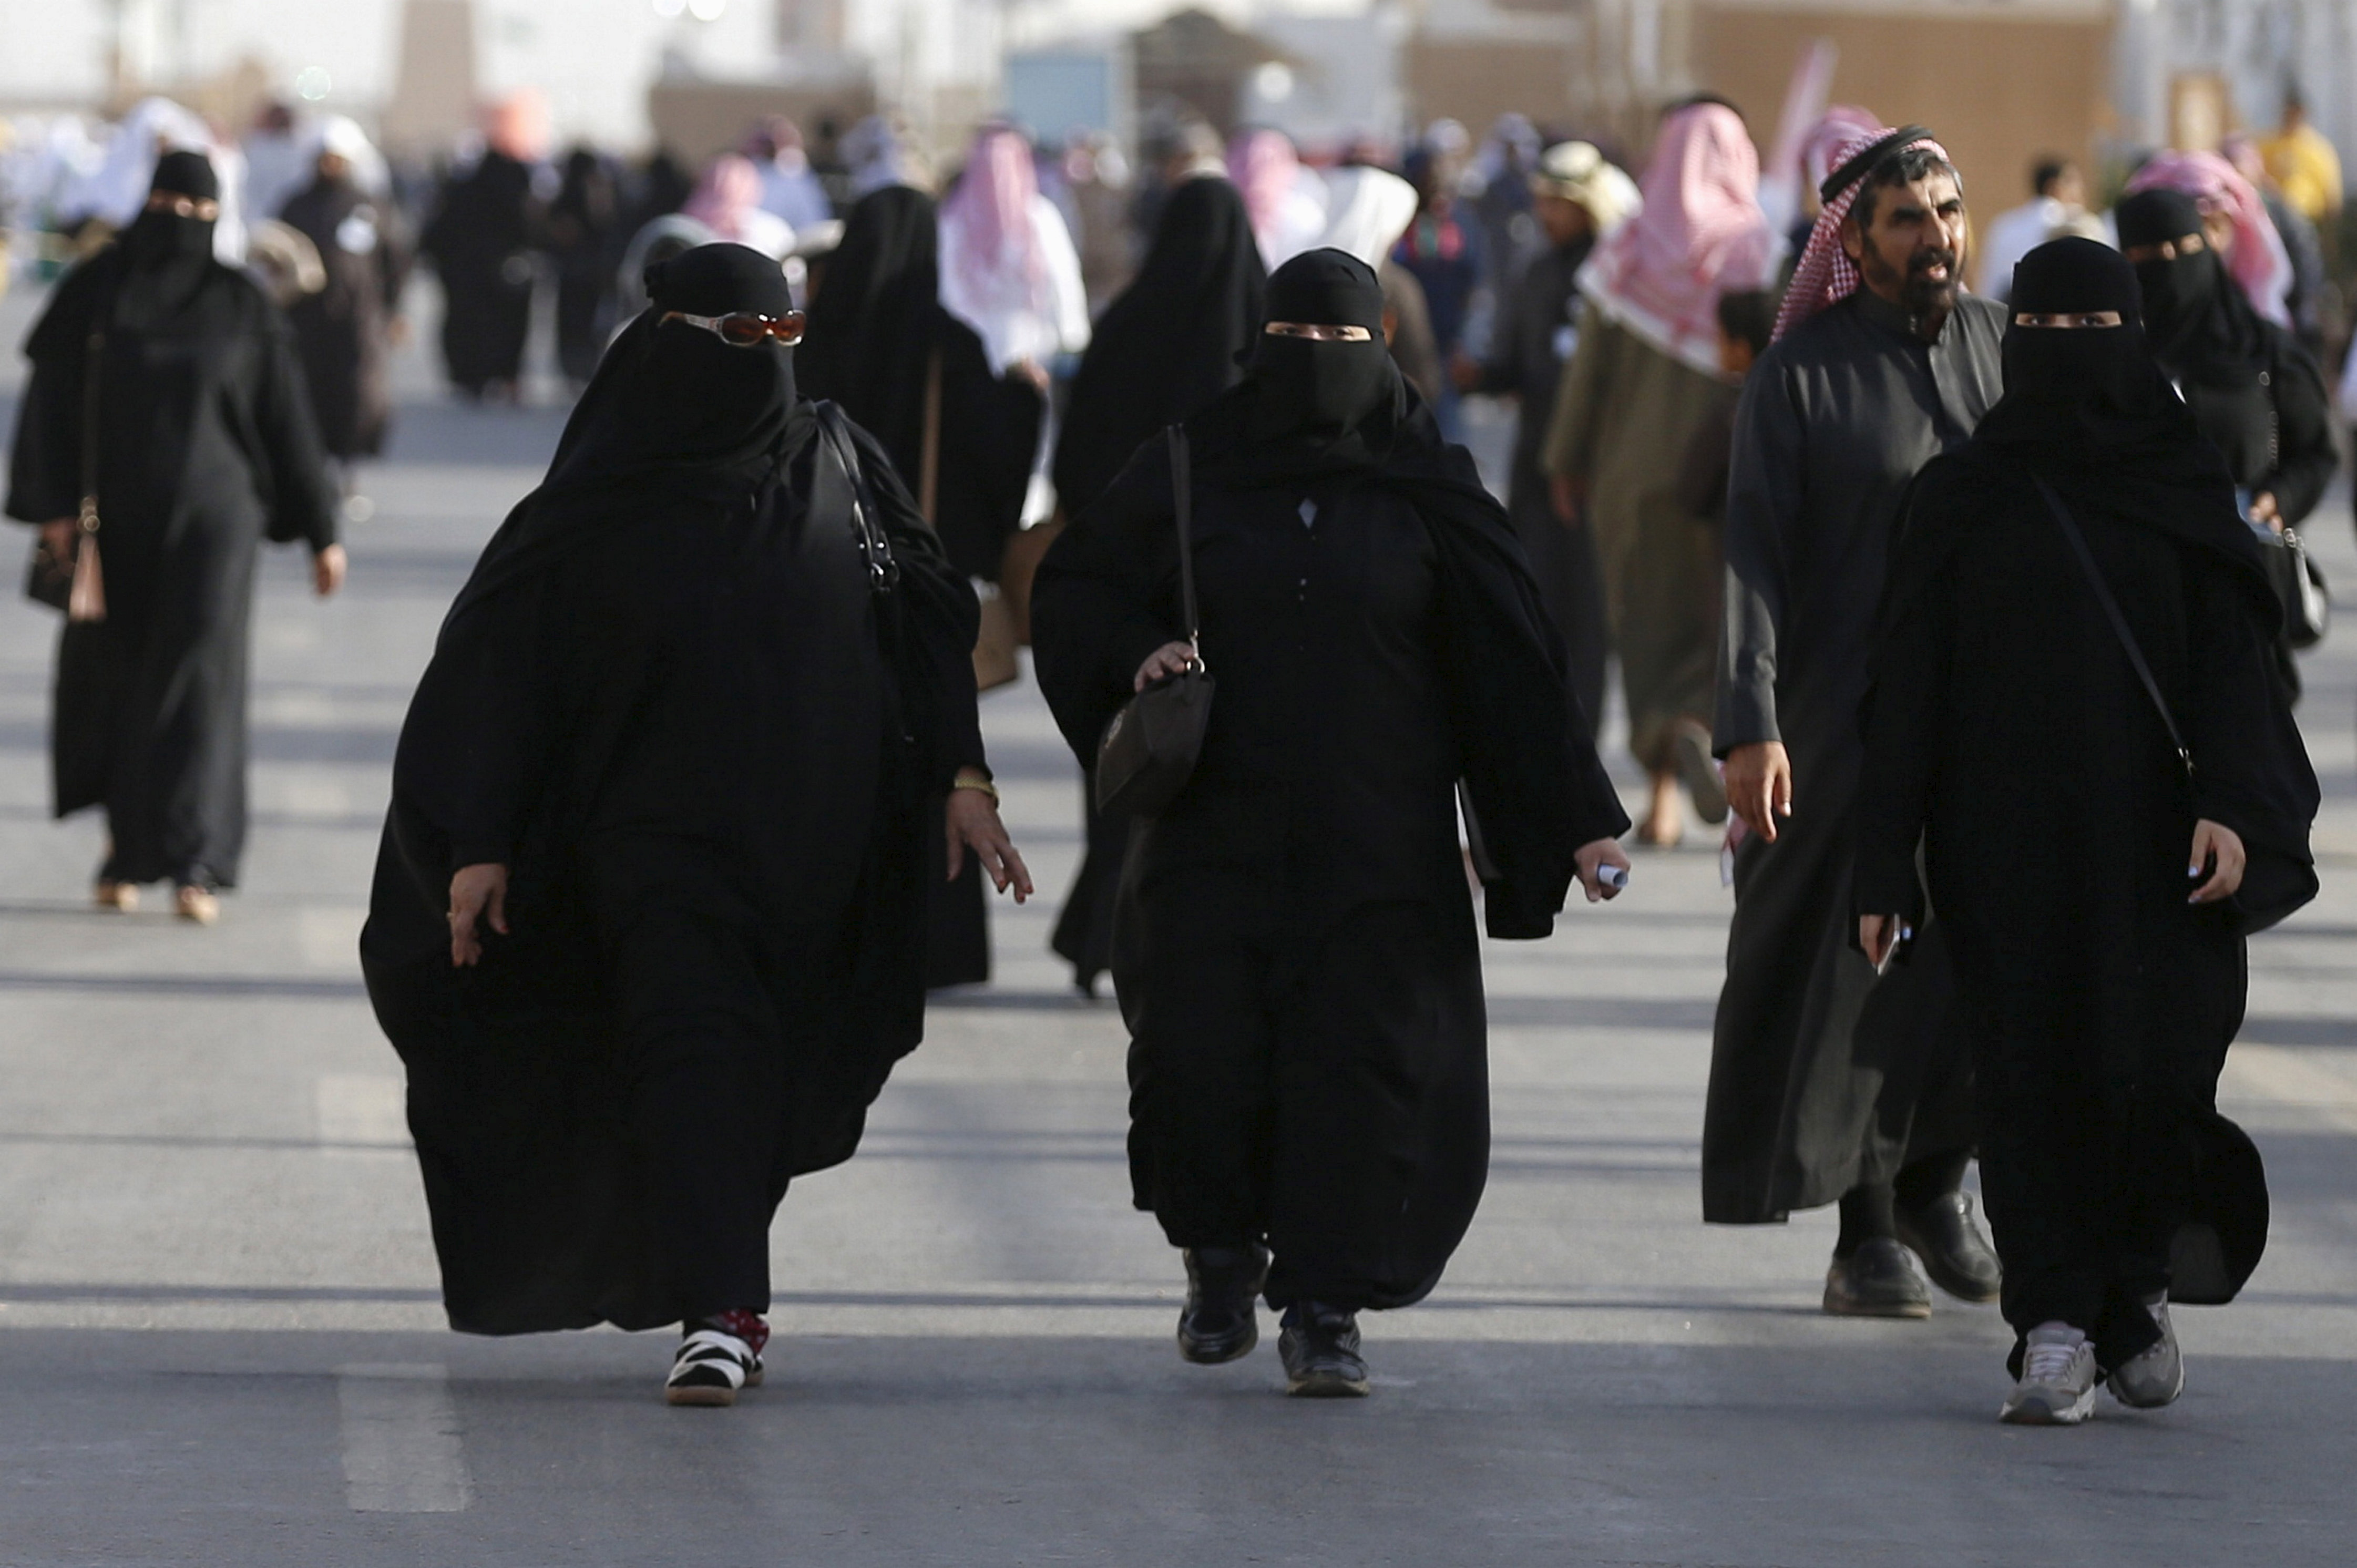 Saudi women arrive to attend Janadriyah Culture Festival on the outskirts of Riyadh on Feb. 8, 2016